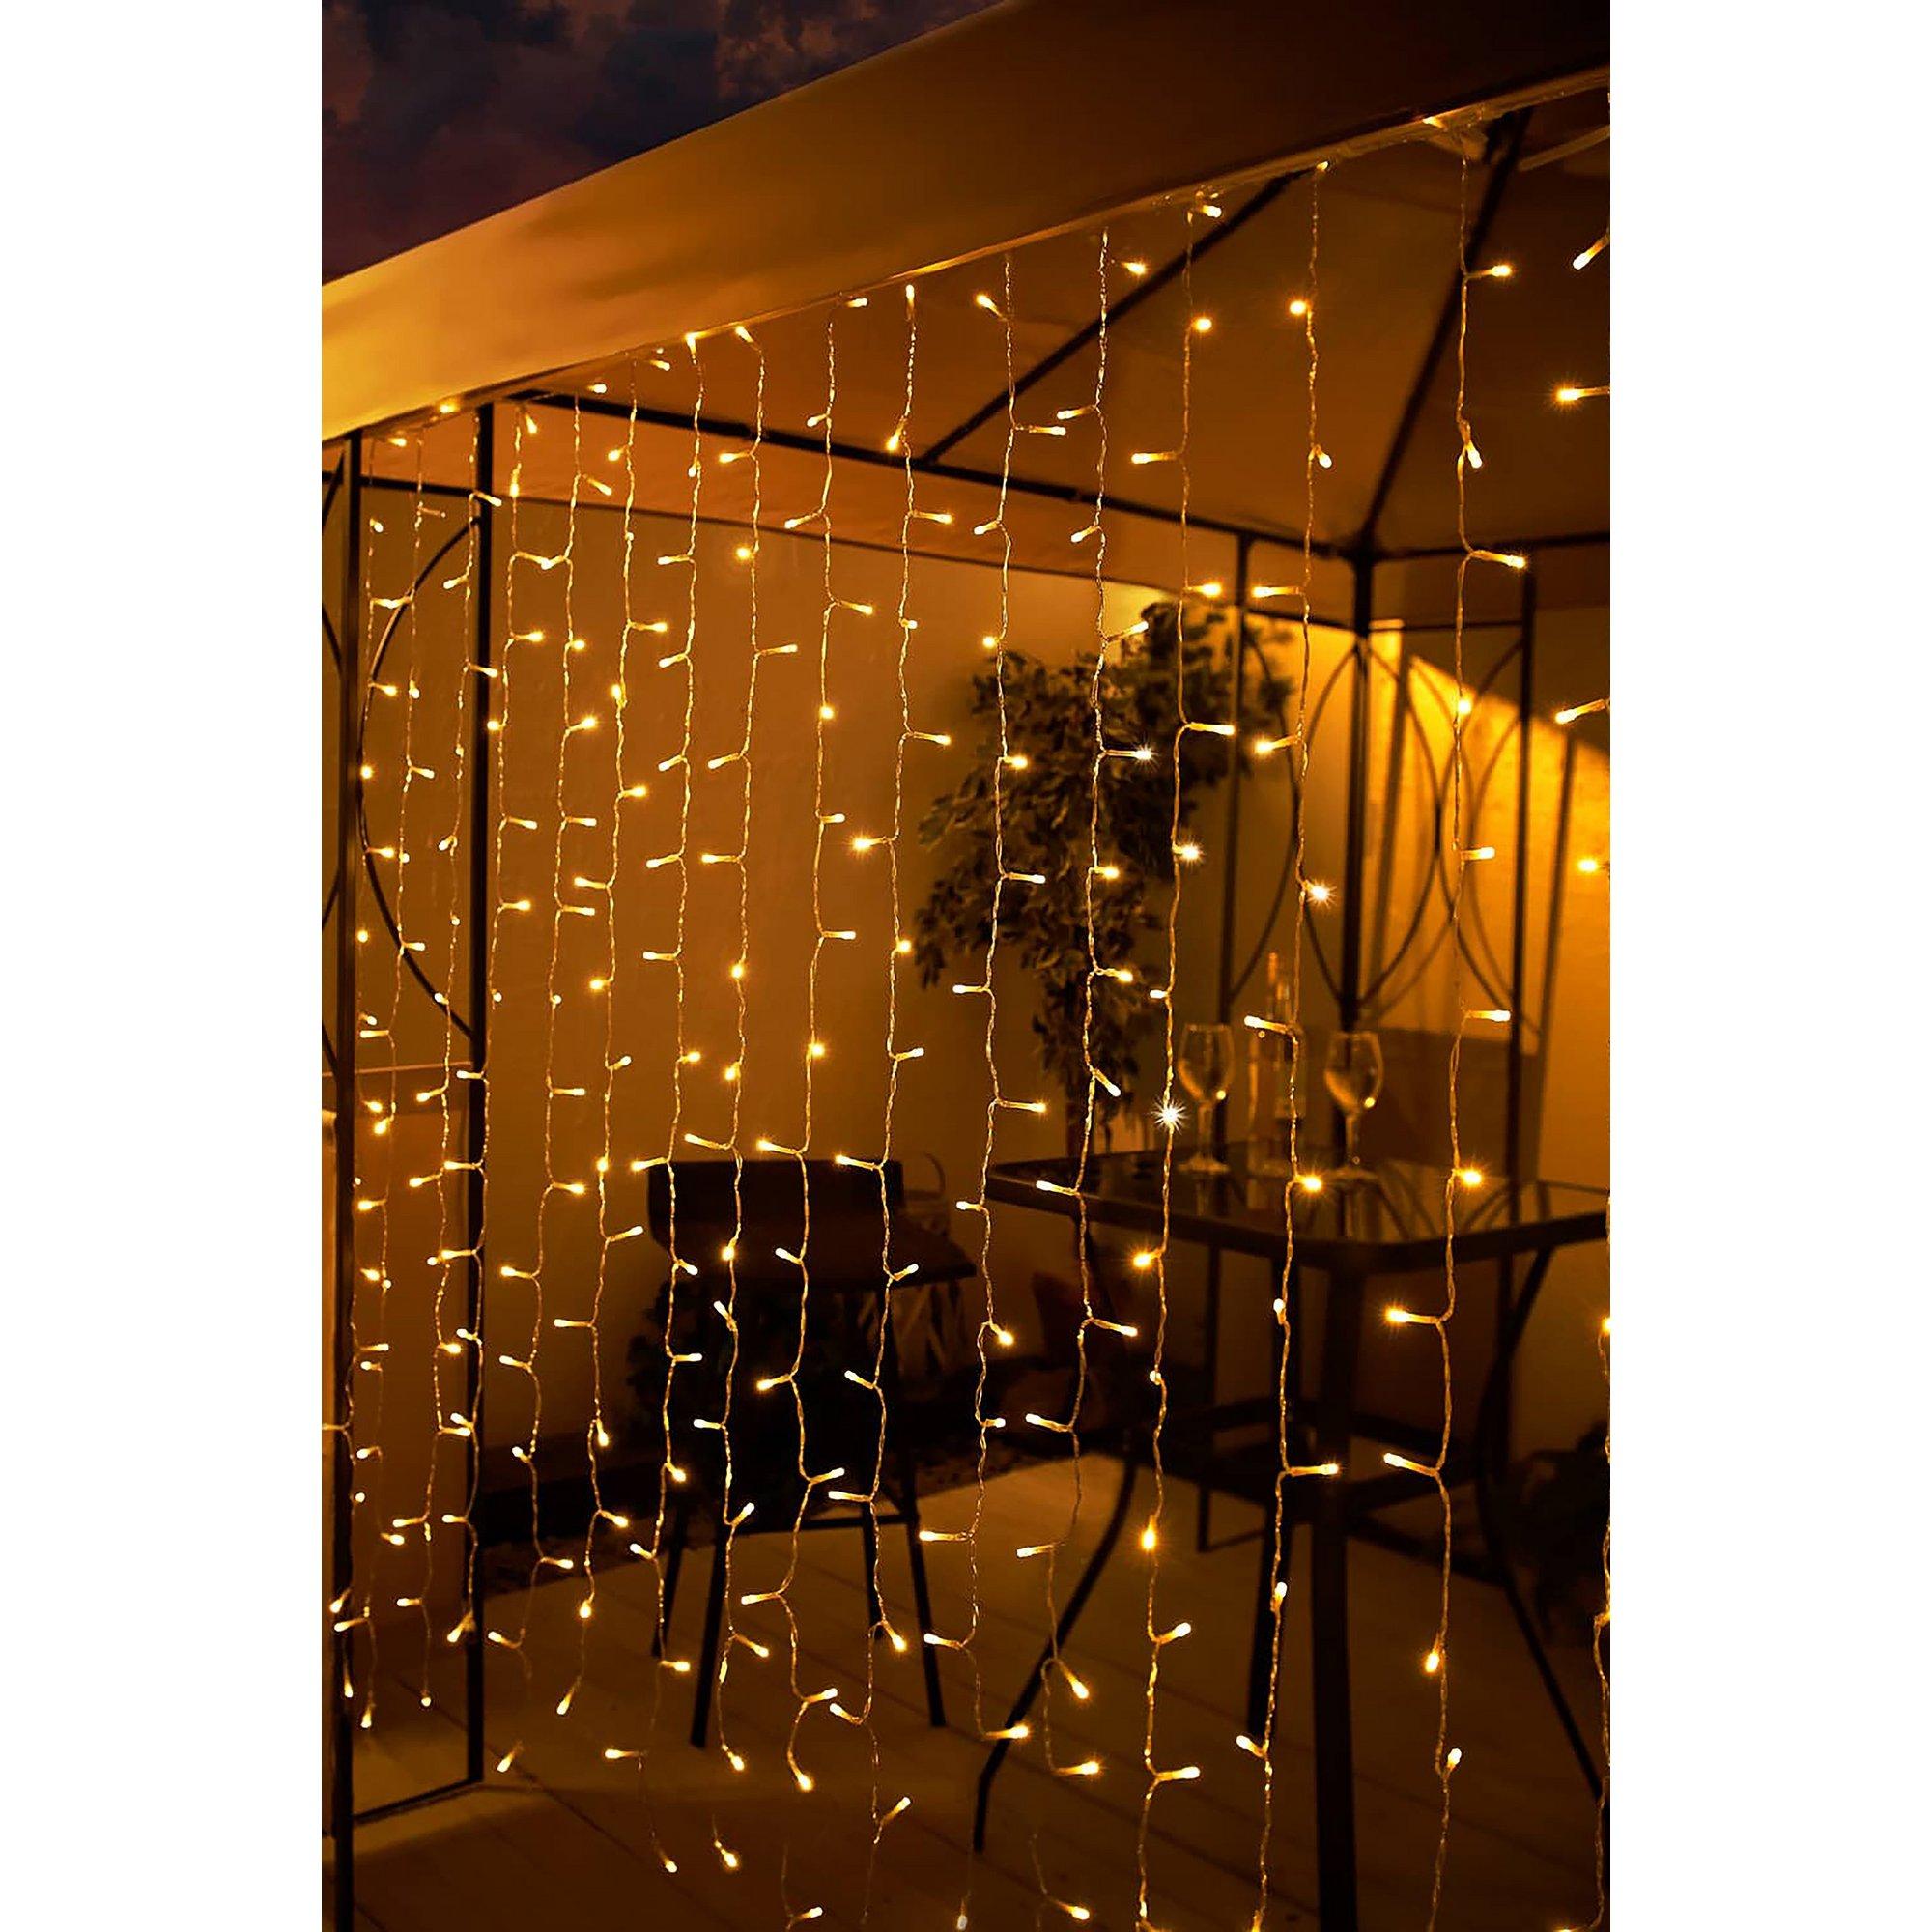 Image of 192 LED Solar Curtain Lights